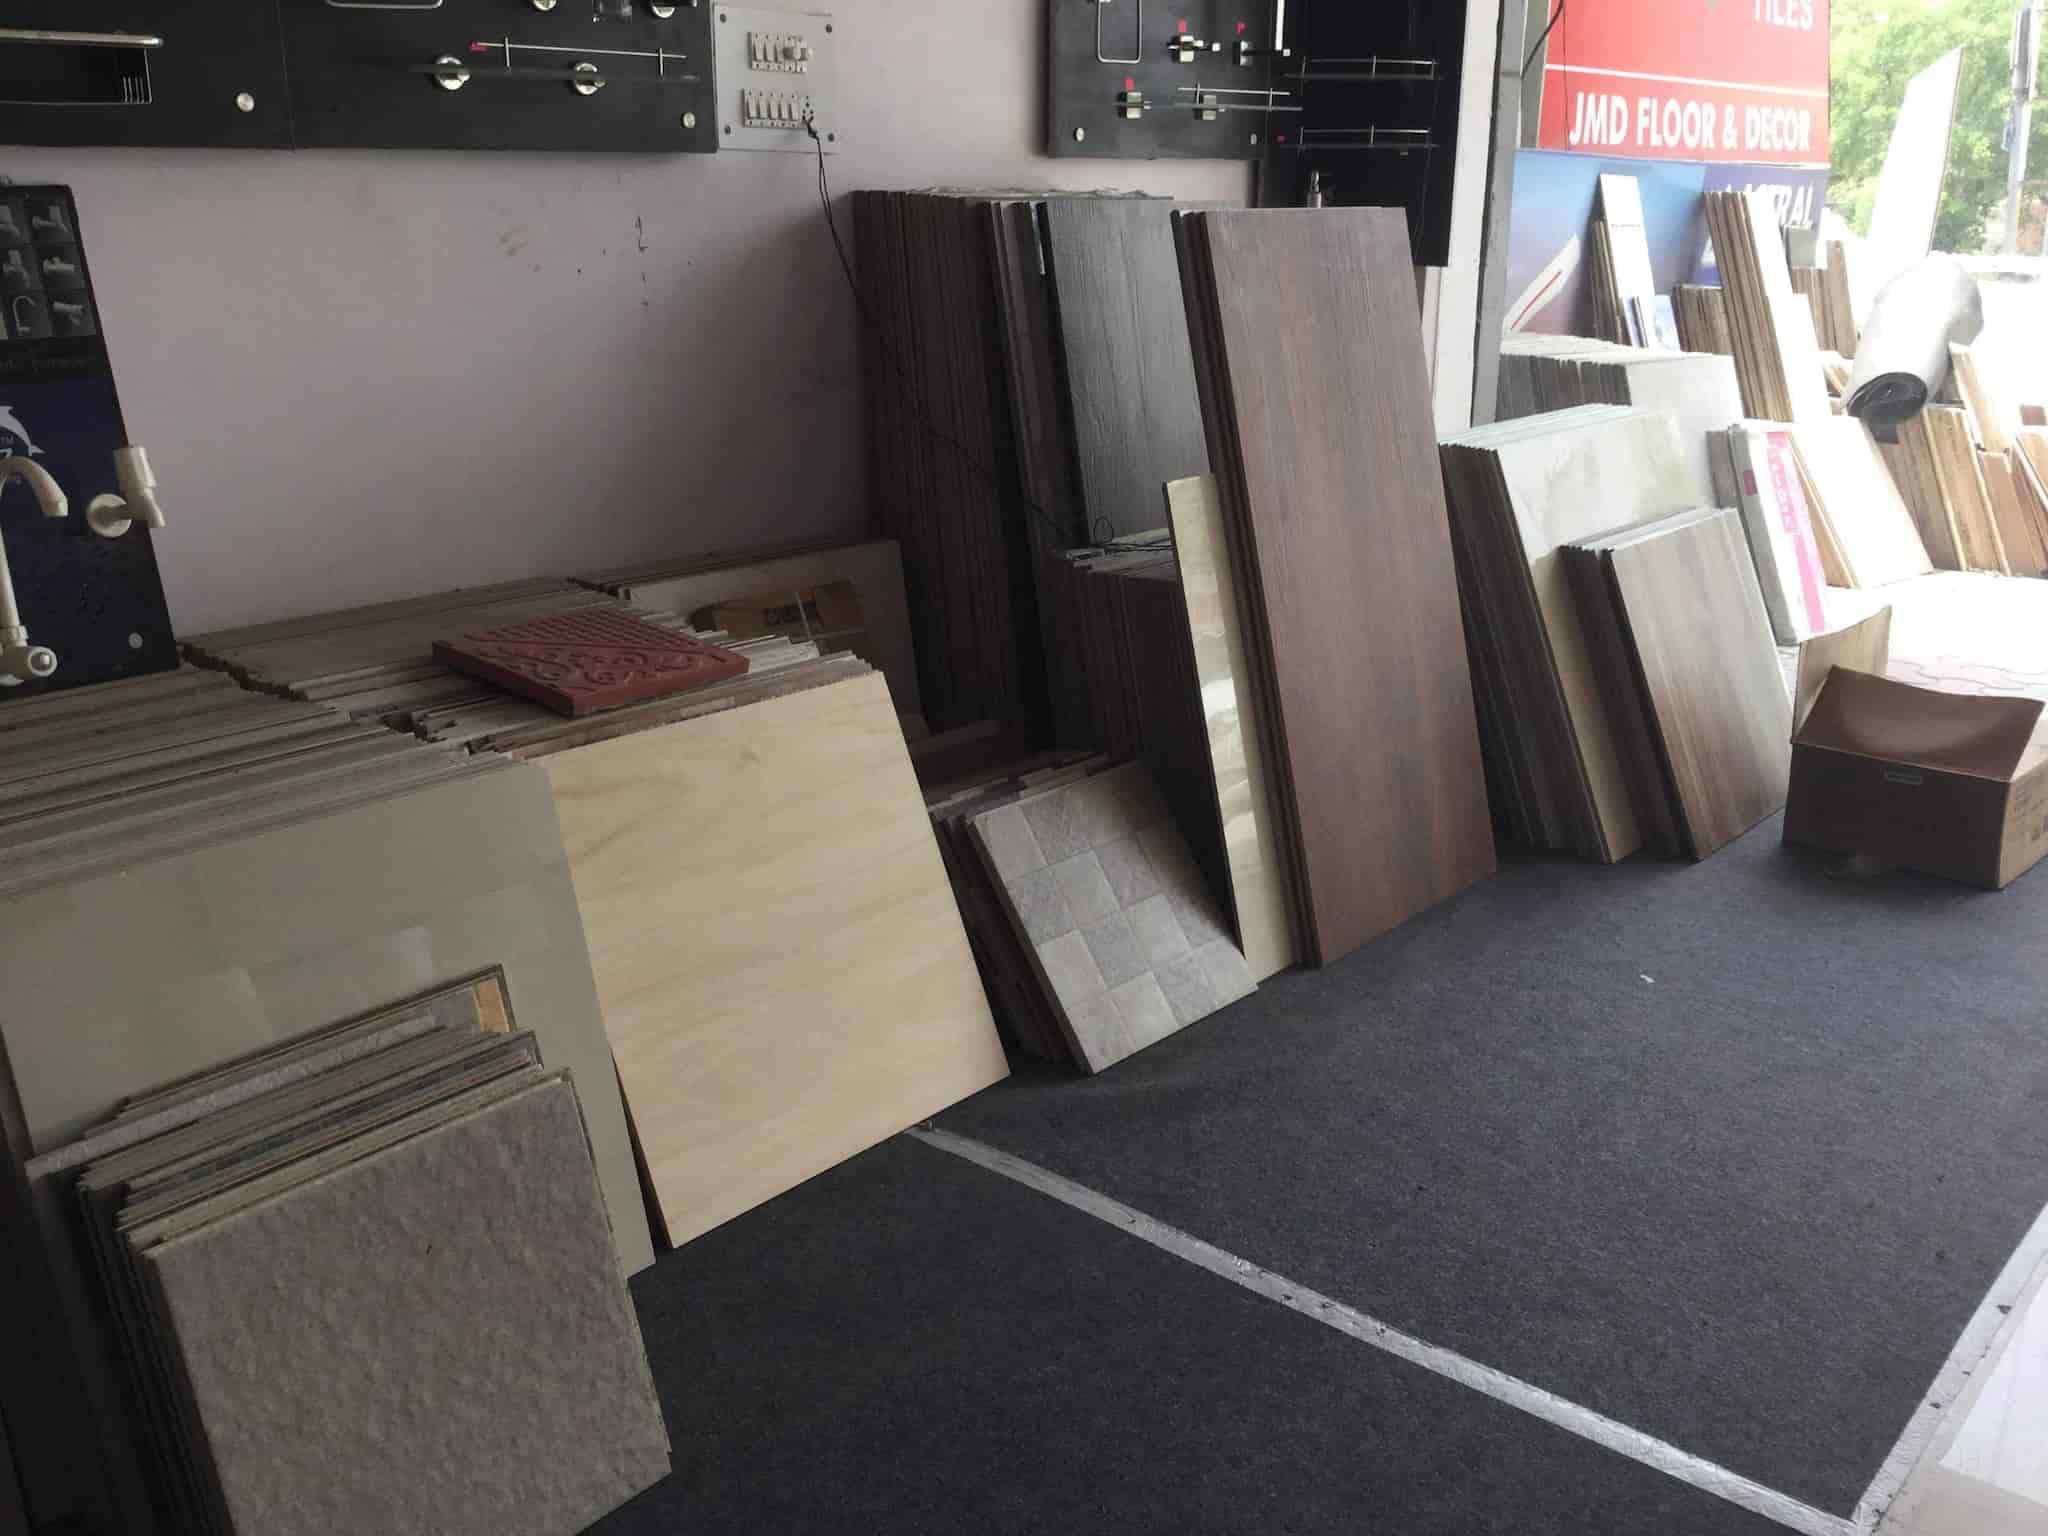 Jmd Floor And Decor Sector 9 Tile Dealers In Faridabad Delhi